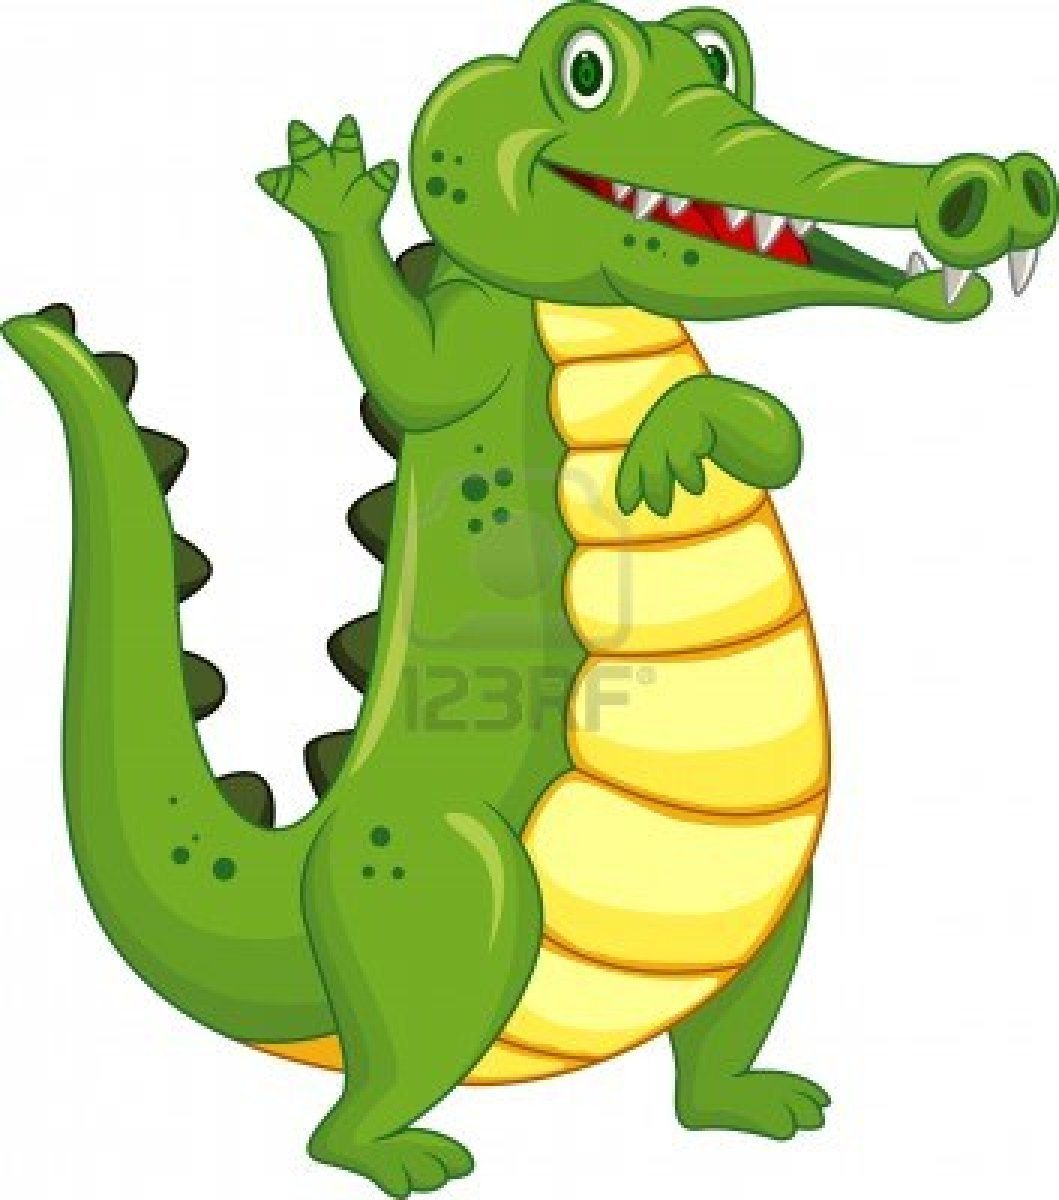 Dessins en couleurs imprimer crocodile num ro 74266 - Dessin anime de crocodile ...